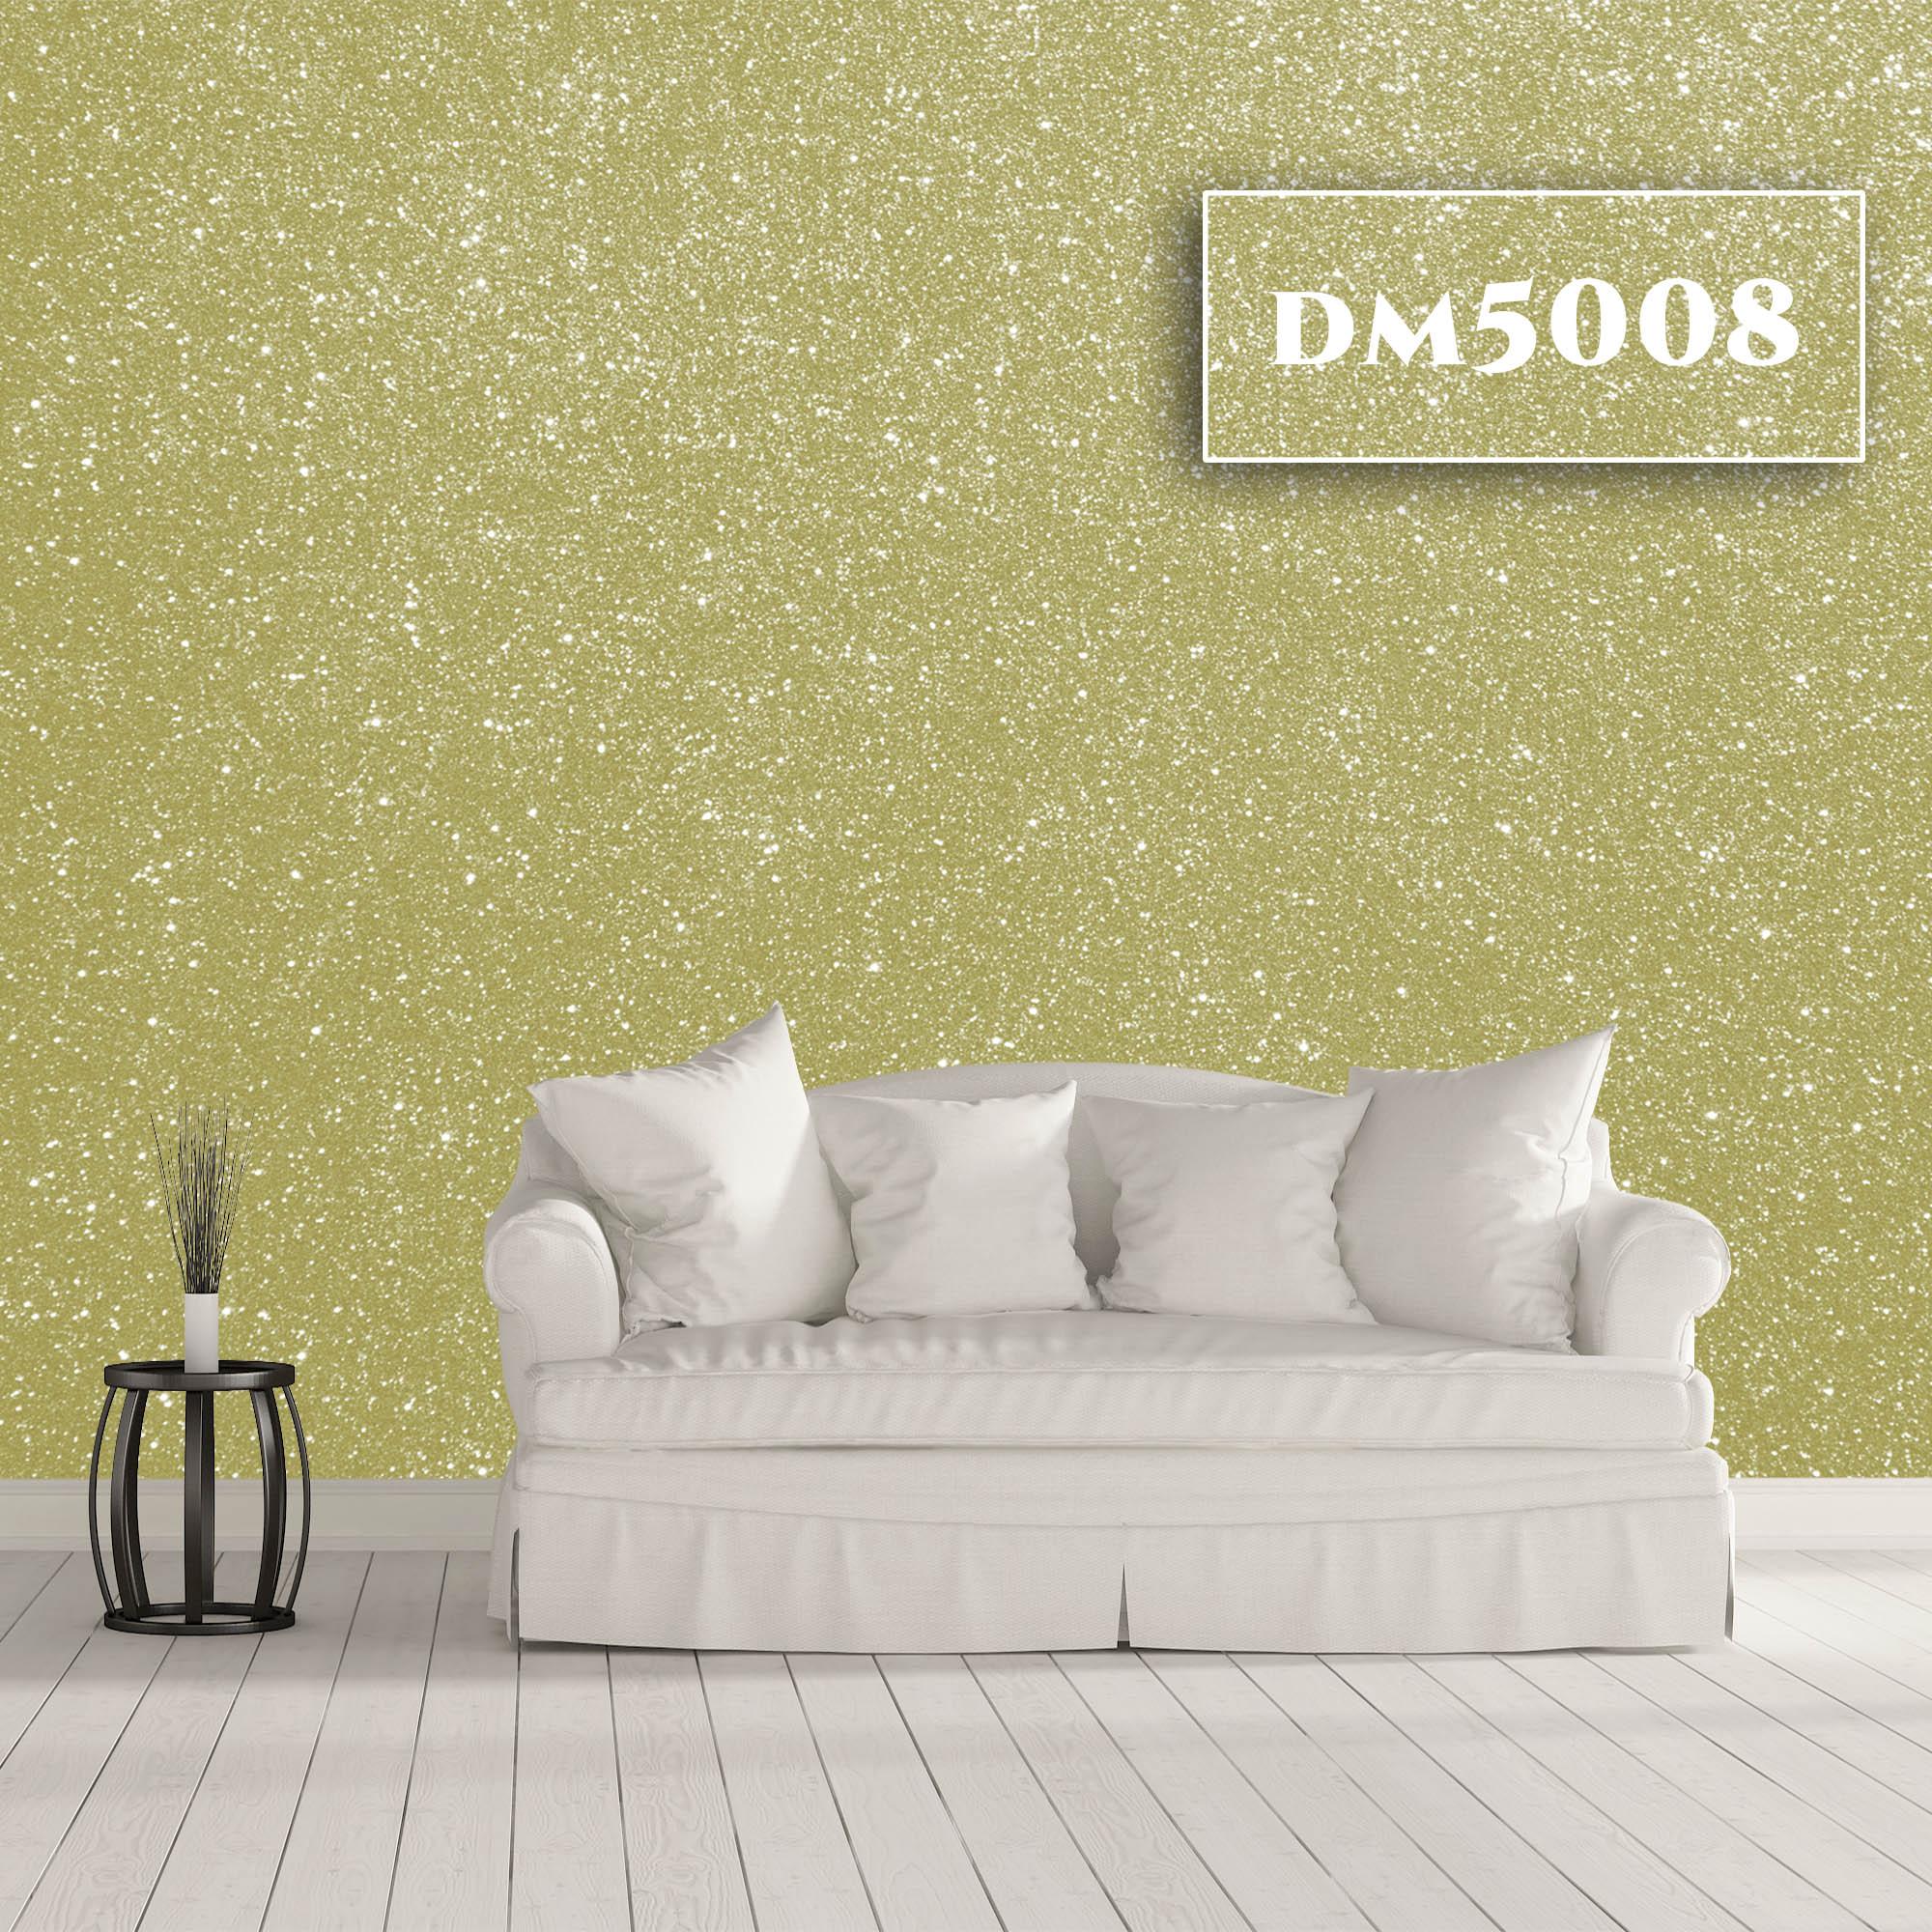 DM5008